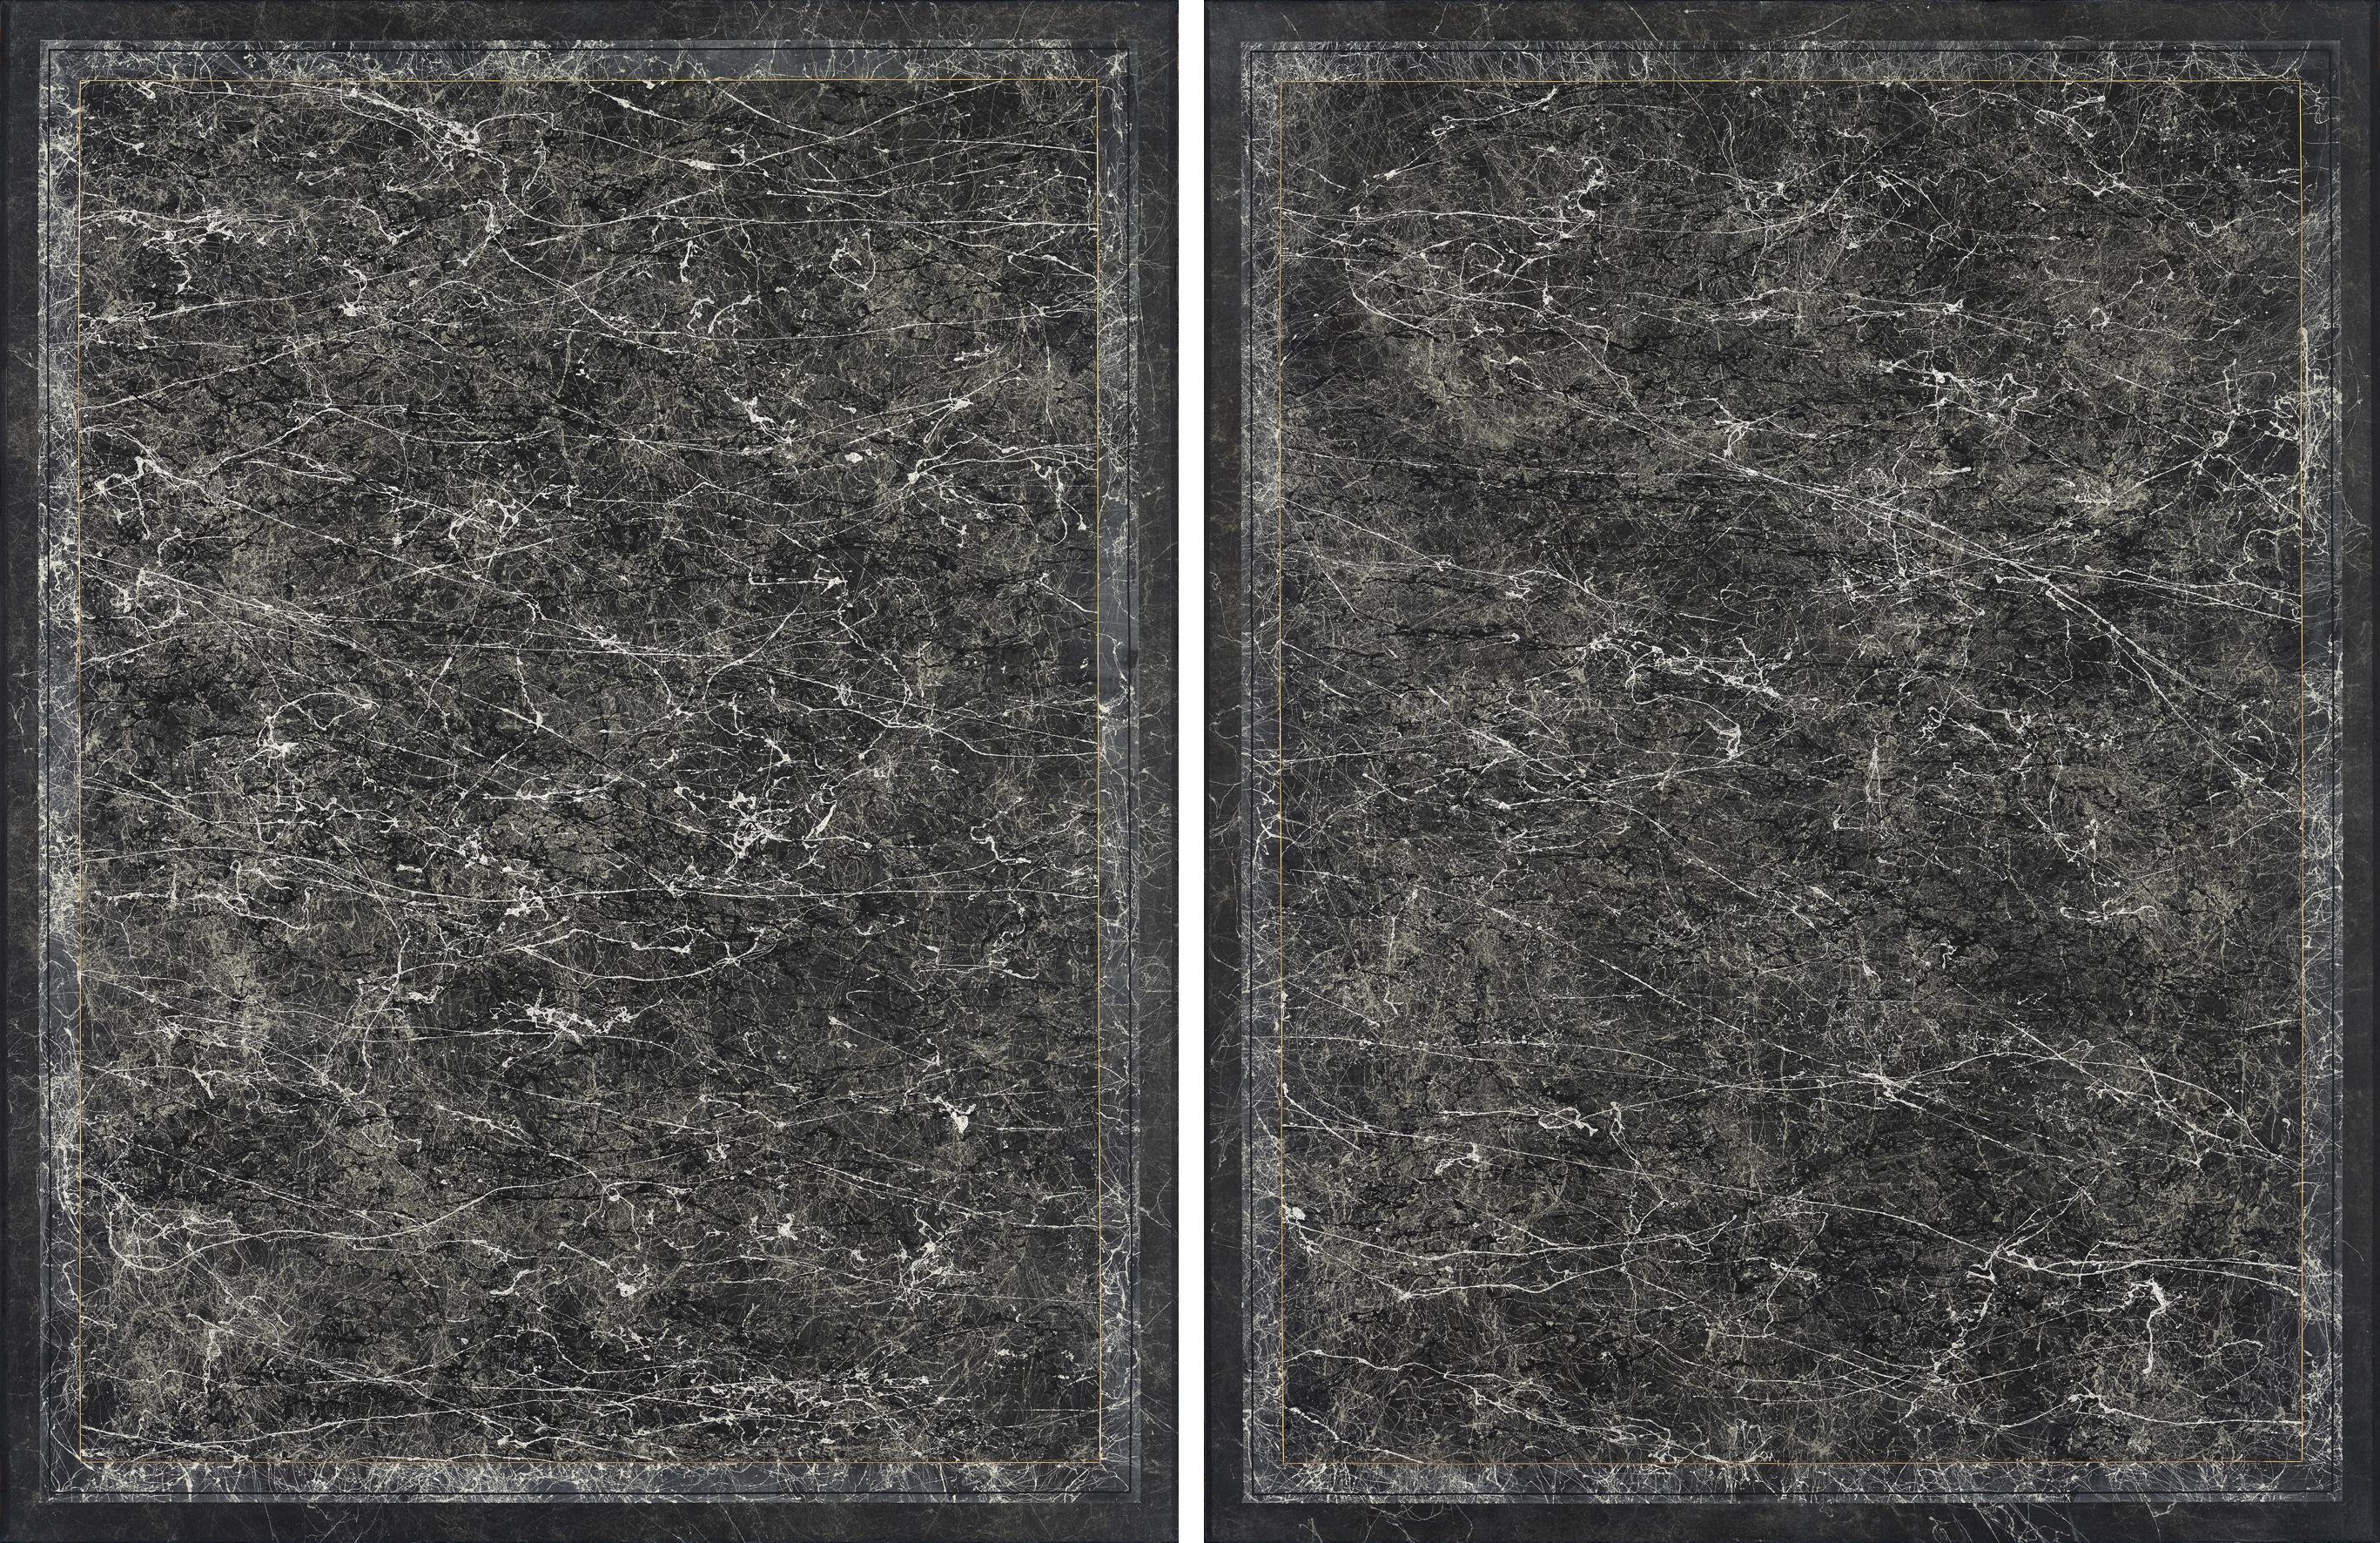 Untitled (slate #1 & #2)